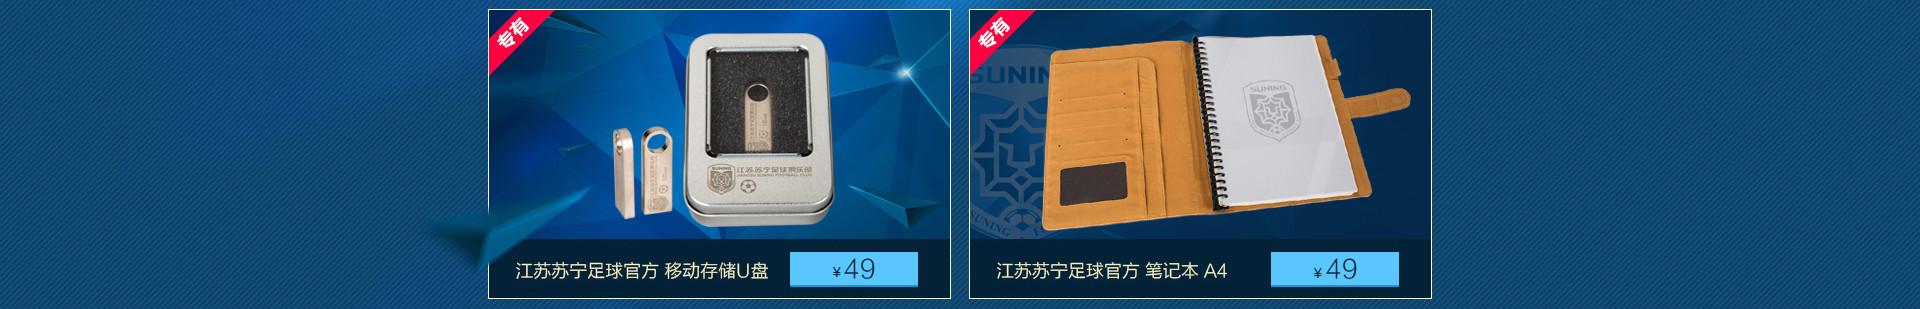 http://image.suning.cn/uimg/sop/commodity/118230607813629367838308_x.jpg